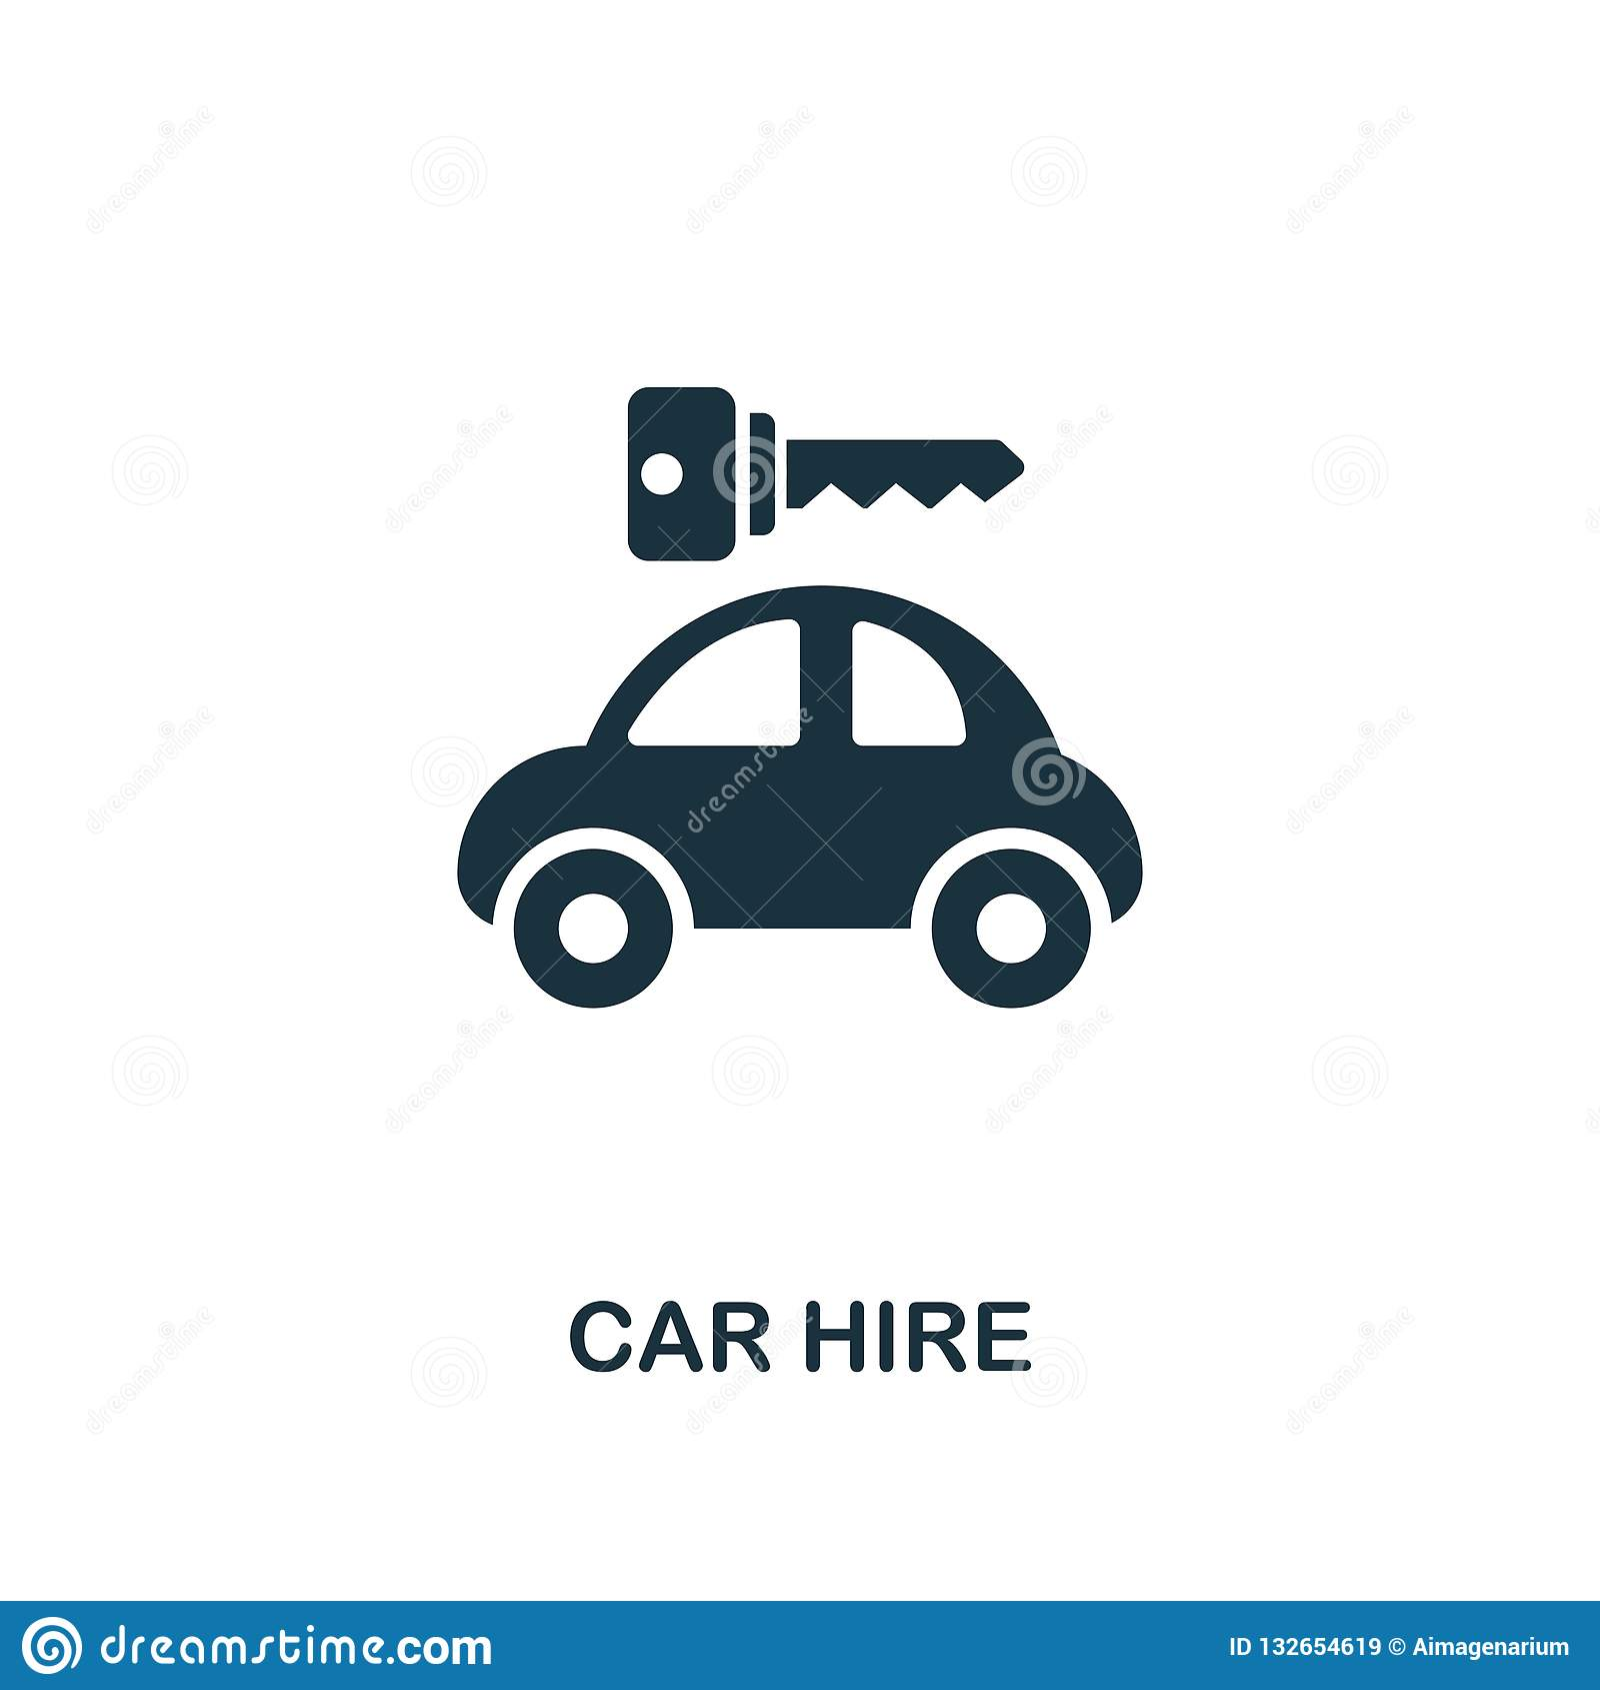 Car Hire Icon Premium Style Design From Public Transport Icon